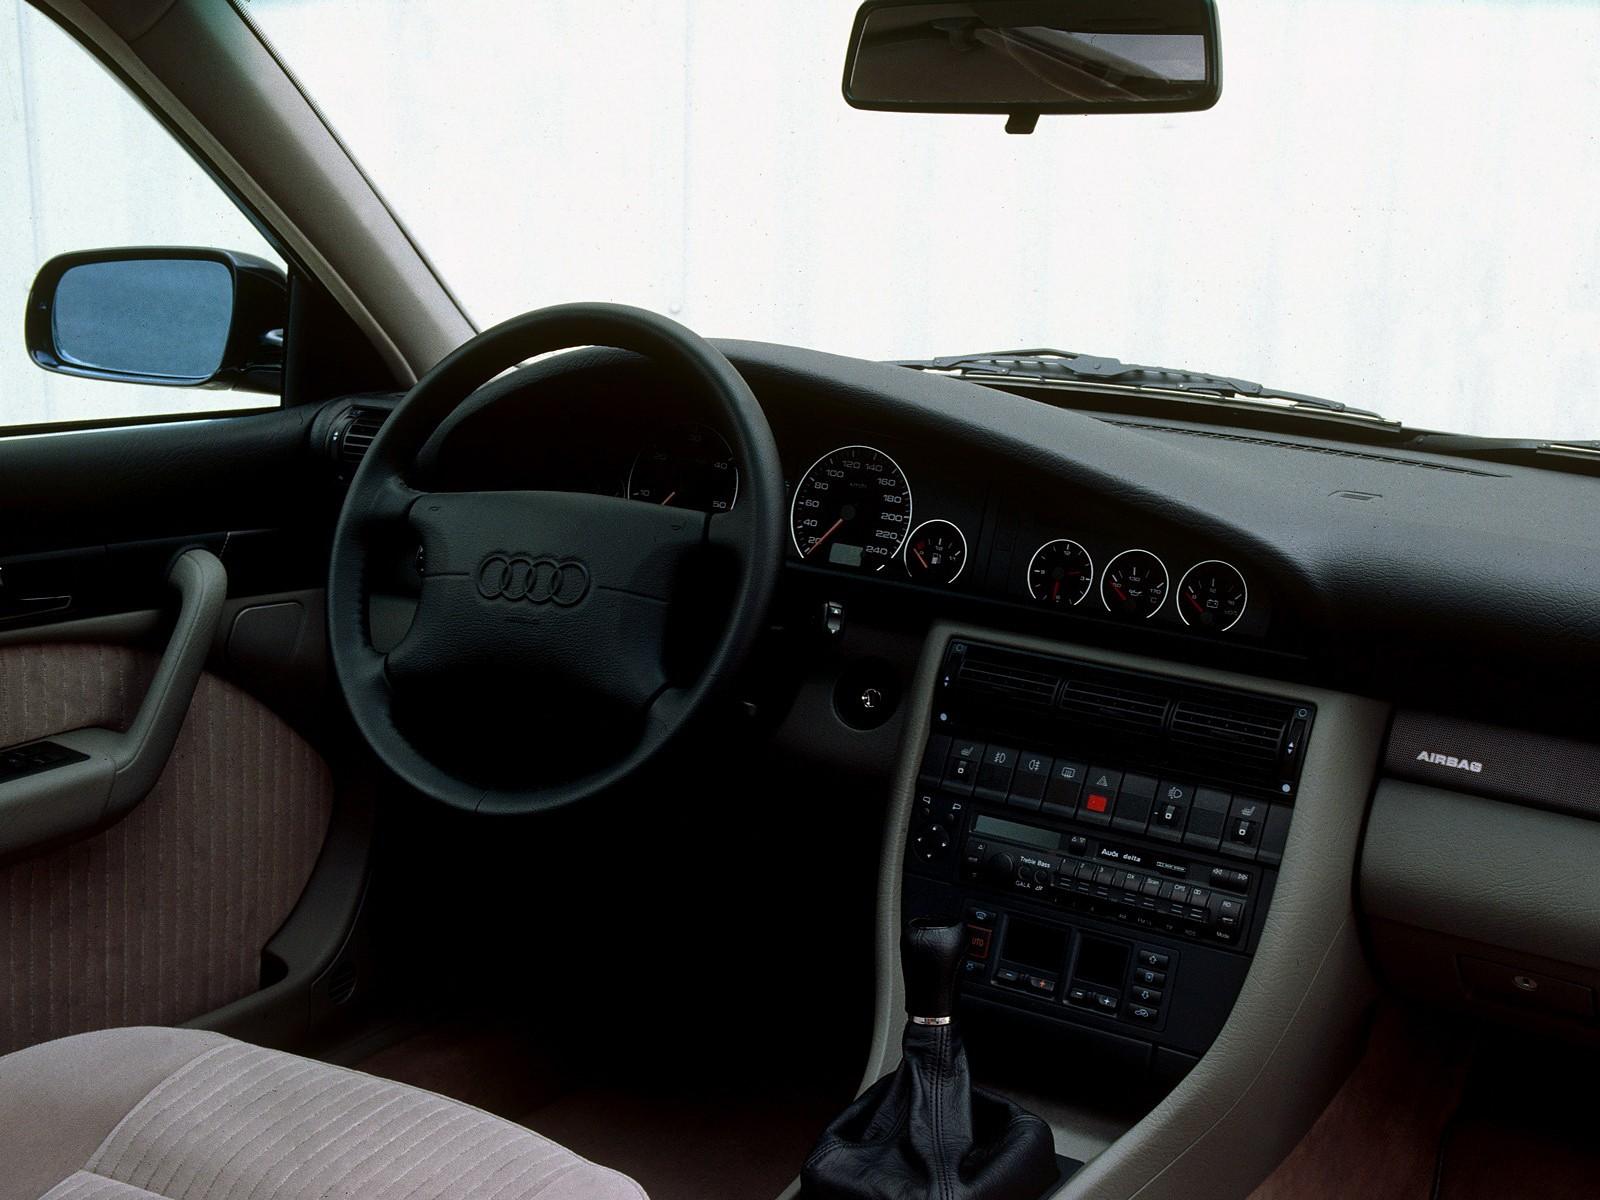 Audi A6 I (C4) 1994 - 1997 Sedan #6